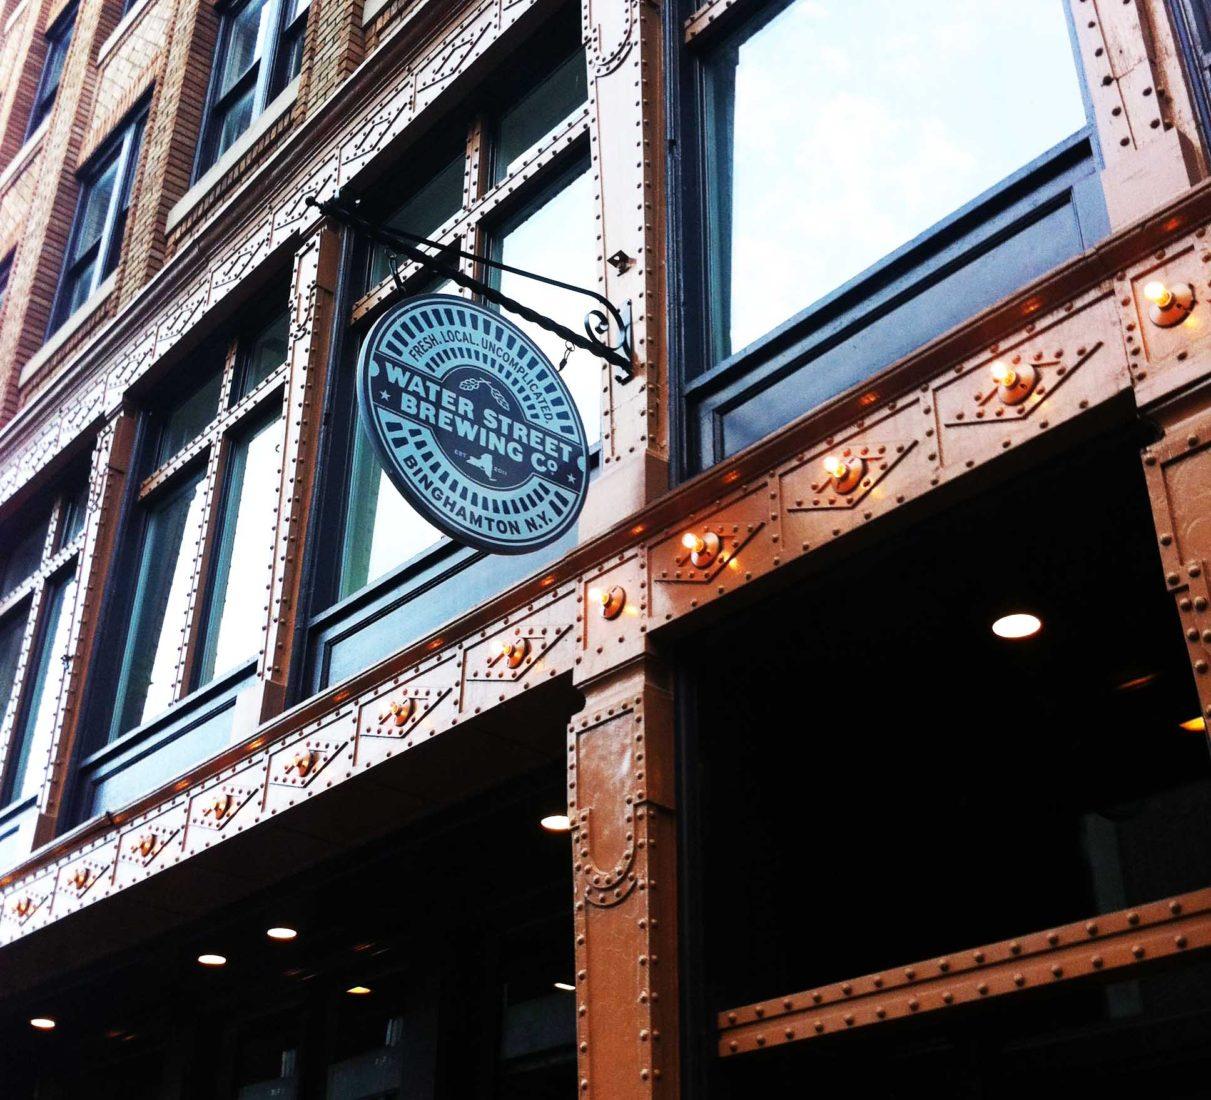 132. Water Street Brewery, Binghamton NY 2012